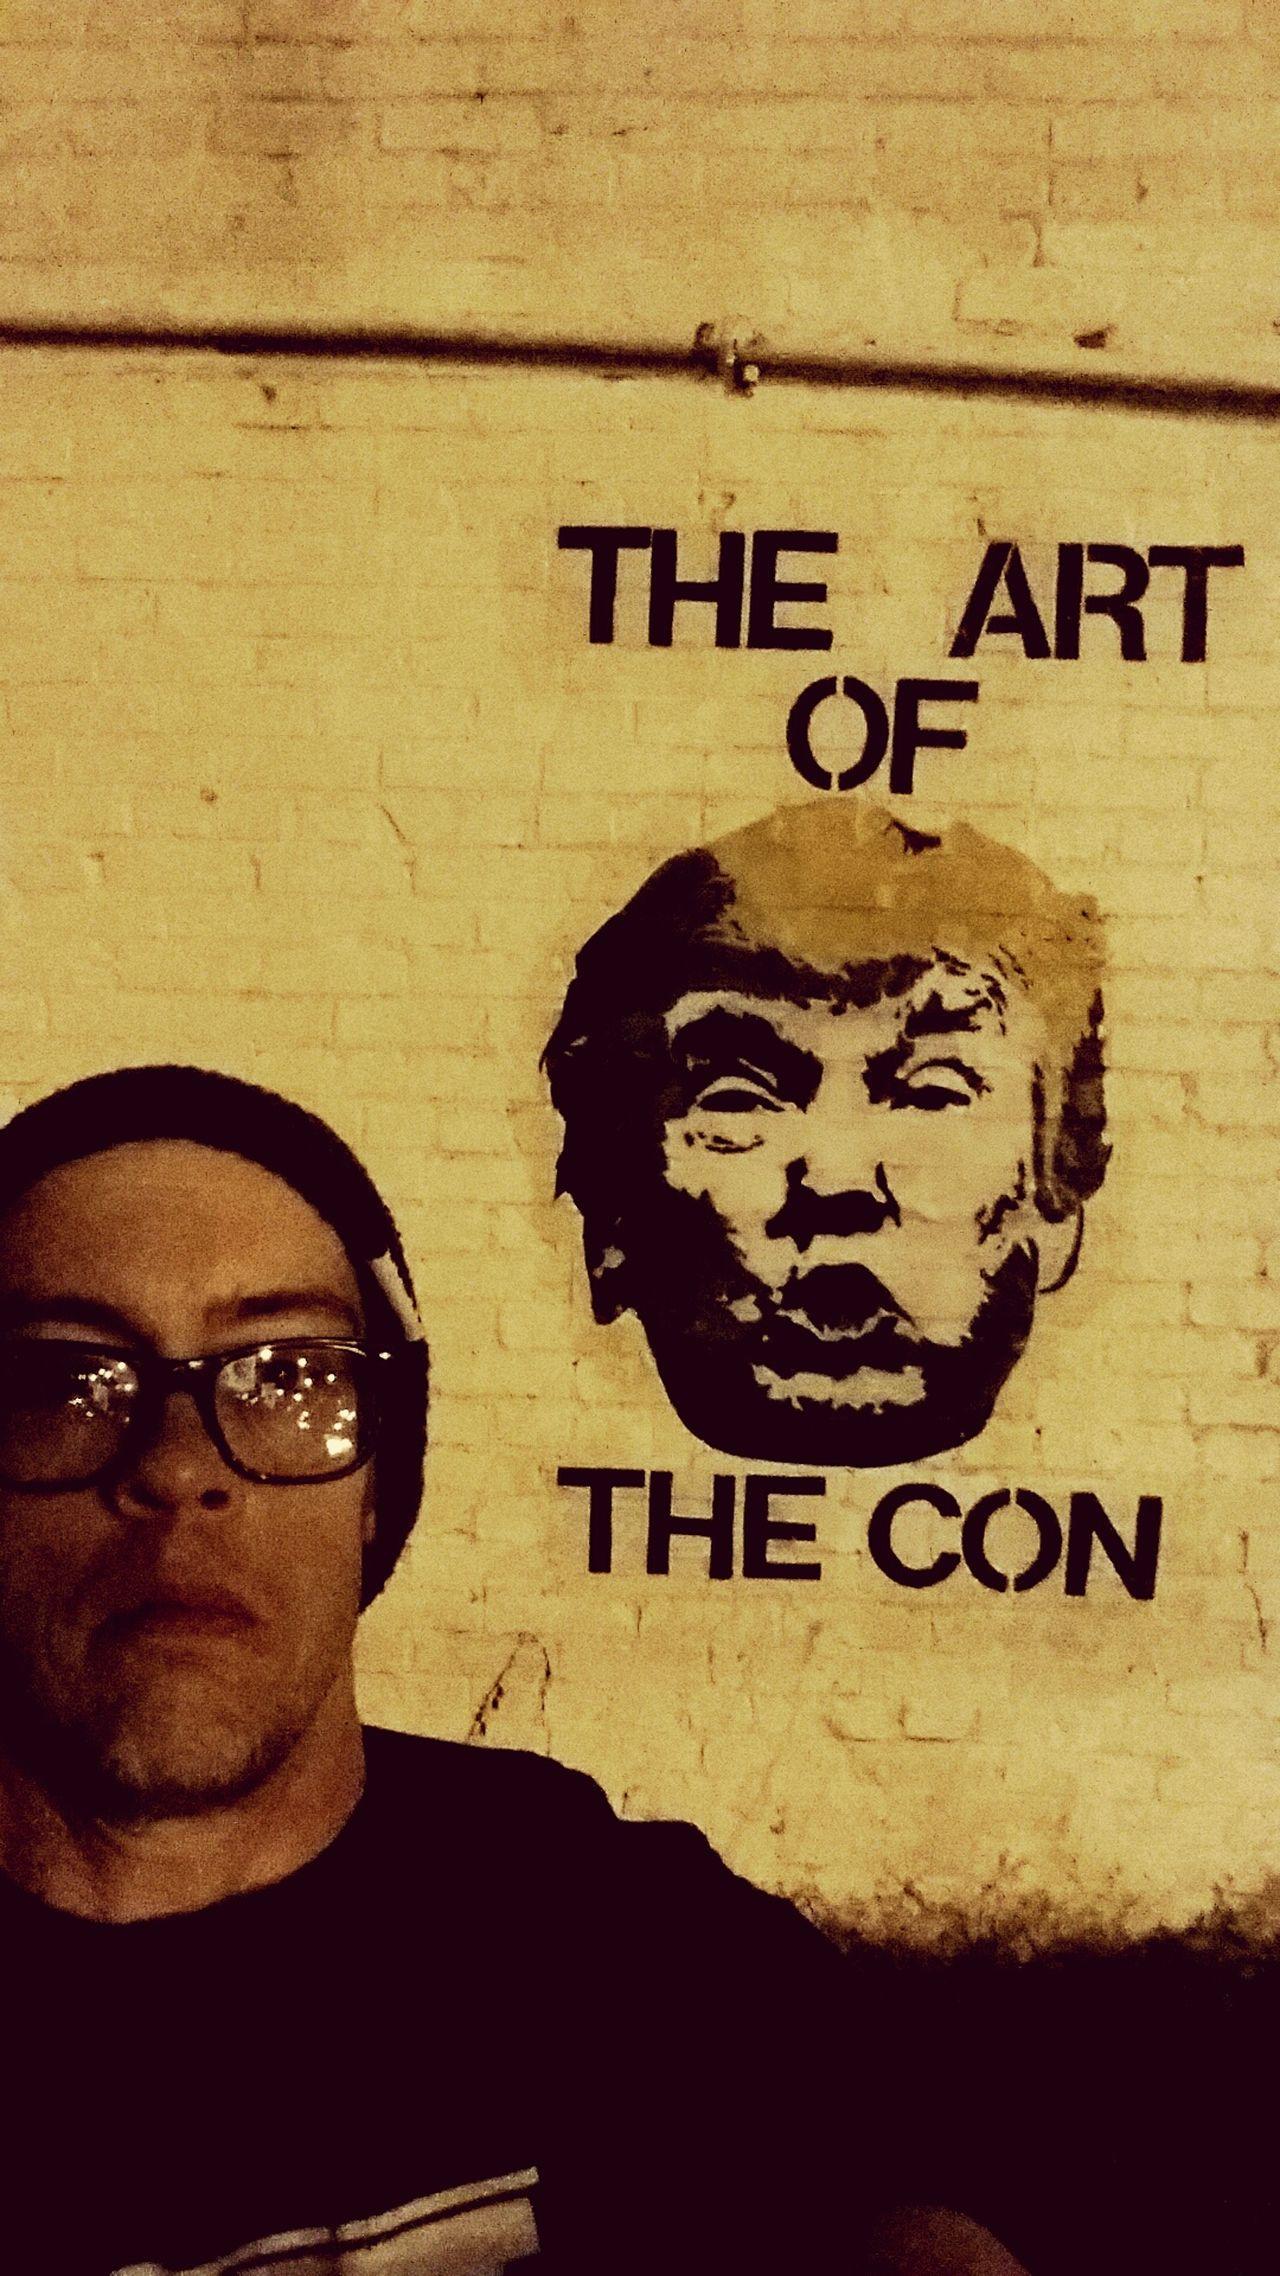 Street Art Graffiti Art Taking Photos Abstract Mafia Studio Street Photography Trump Towers